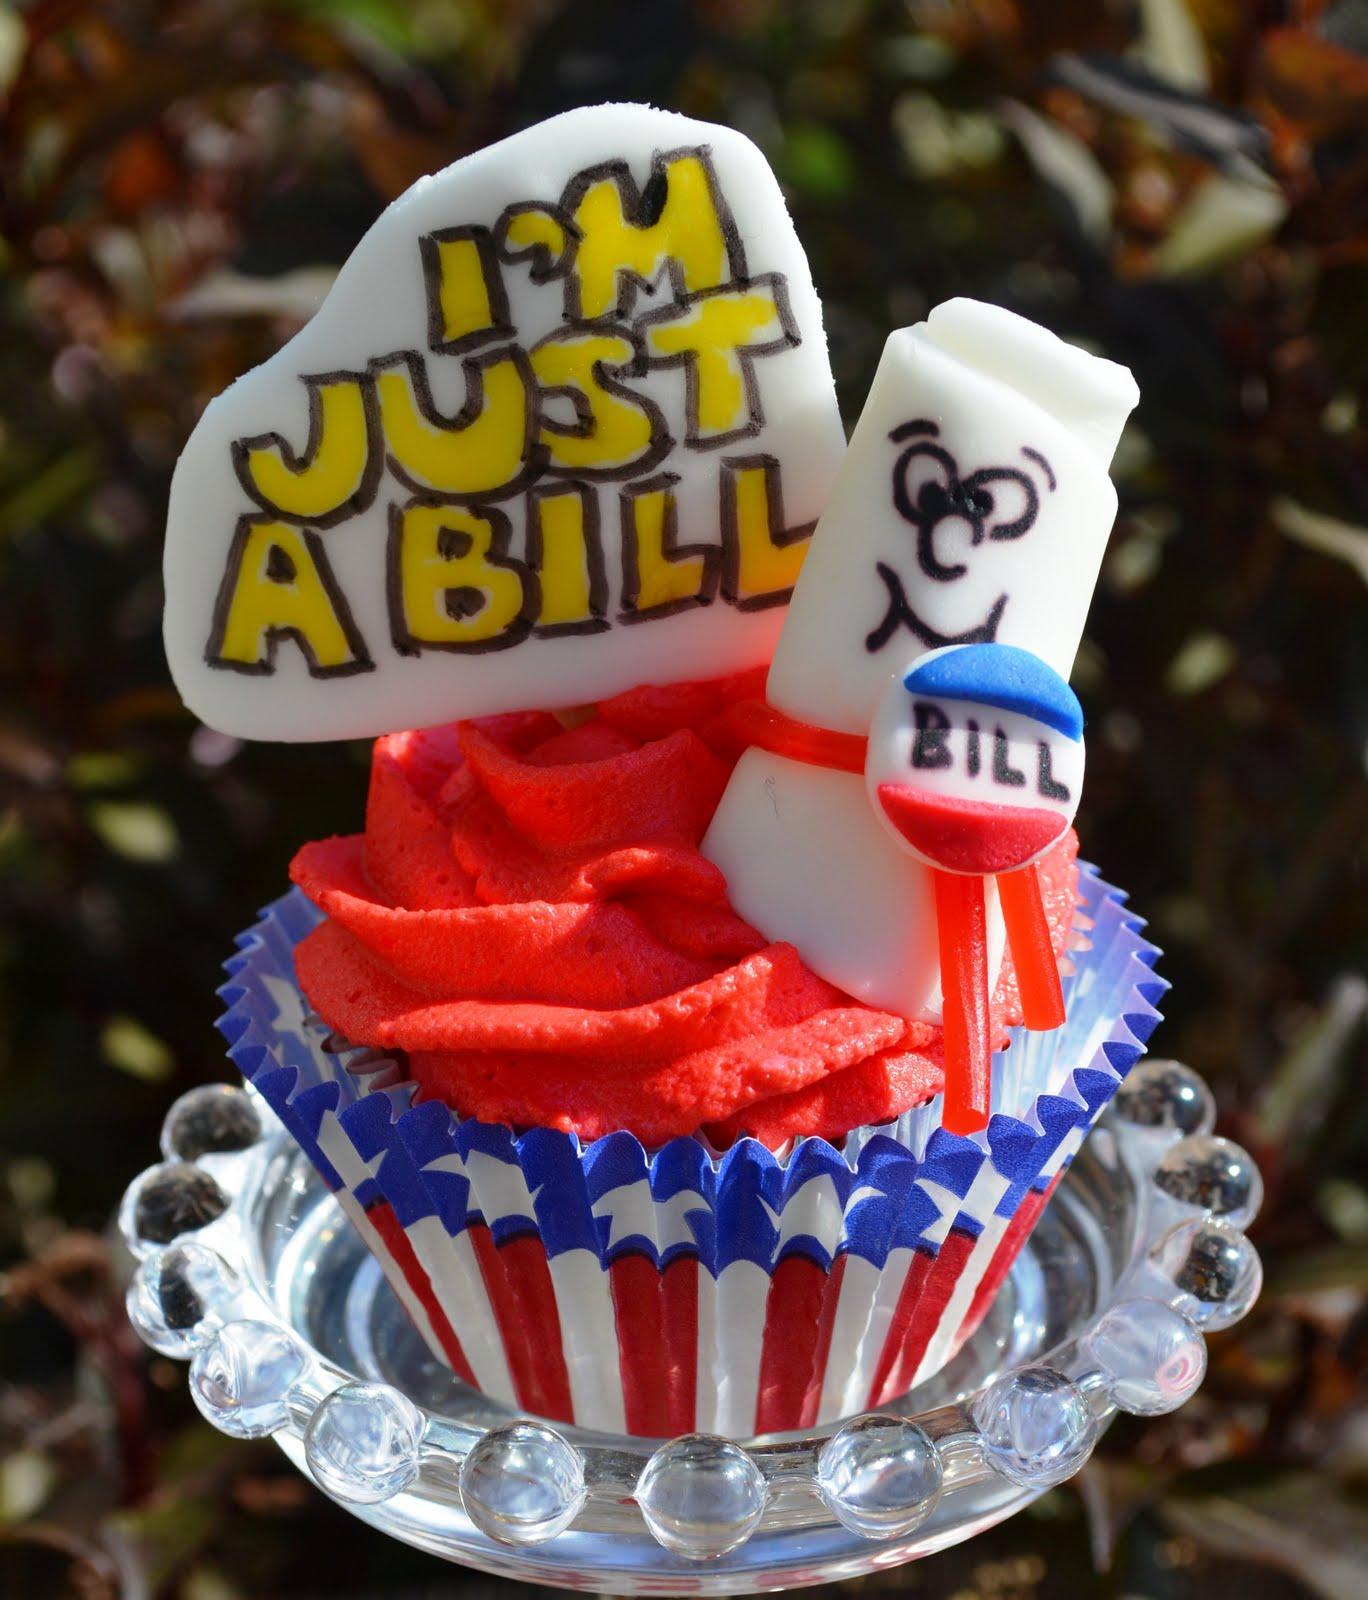 Sweetology School House Rock Cupcake I M Just A Bill